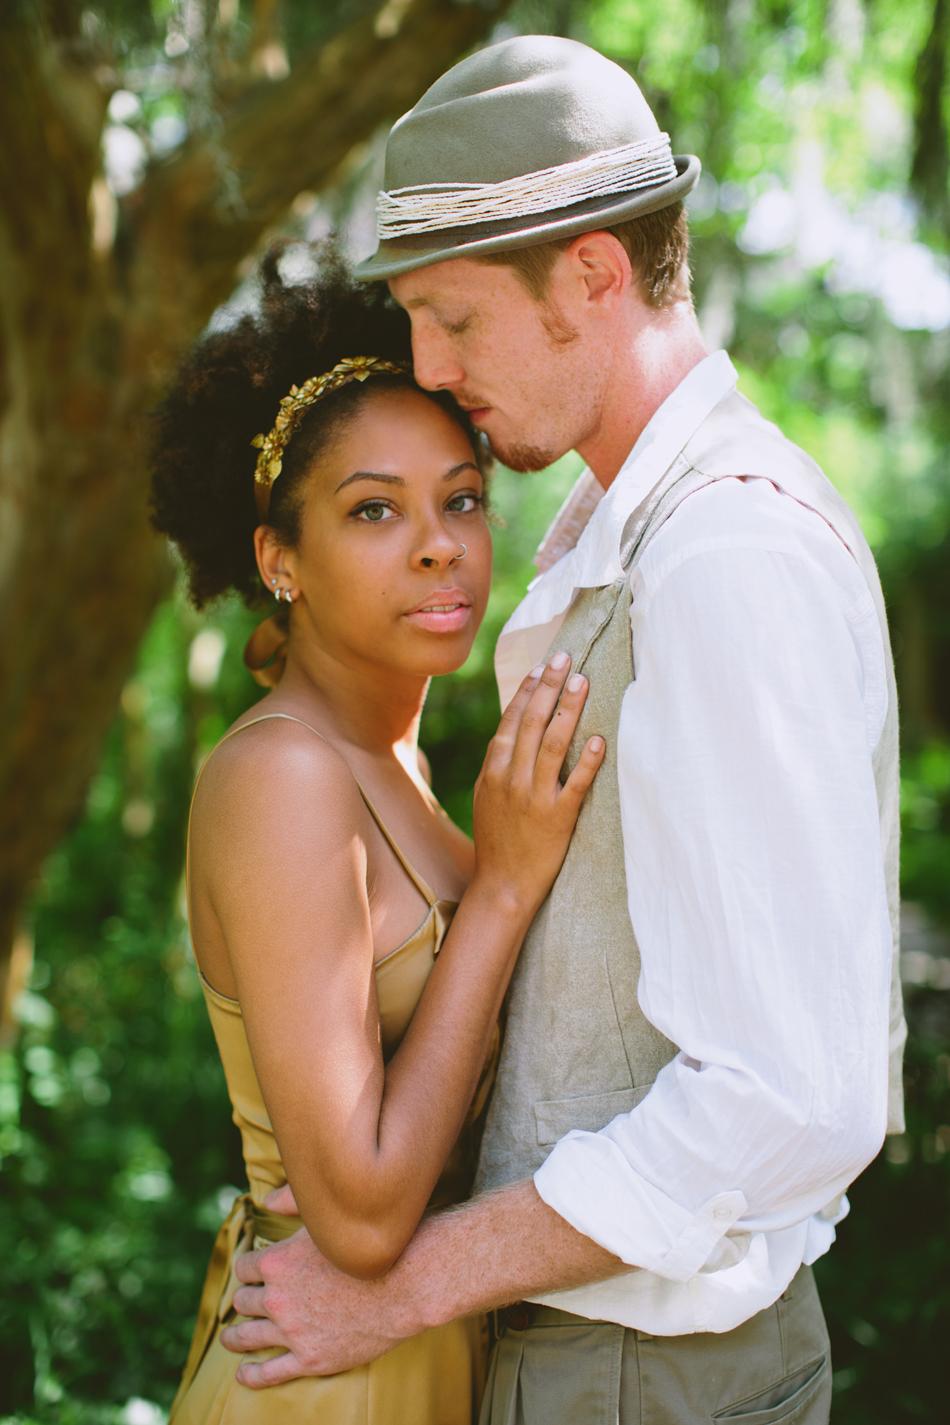 Jameykay_arlie_bohemian_elopement_styled_shoot014.jpg